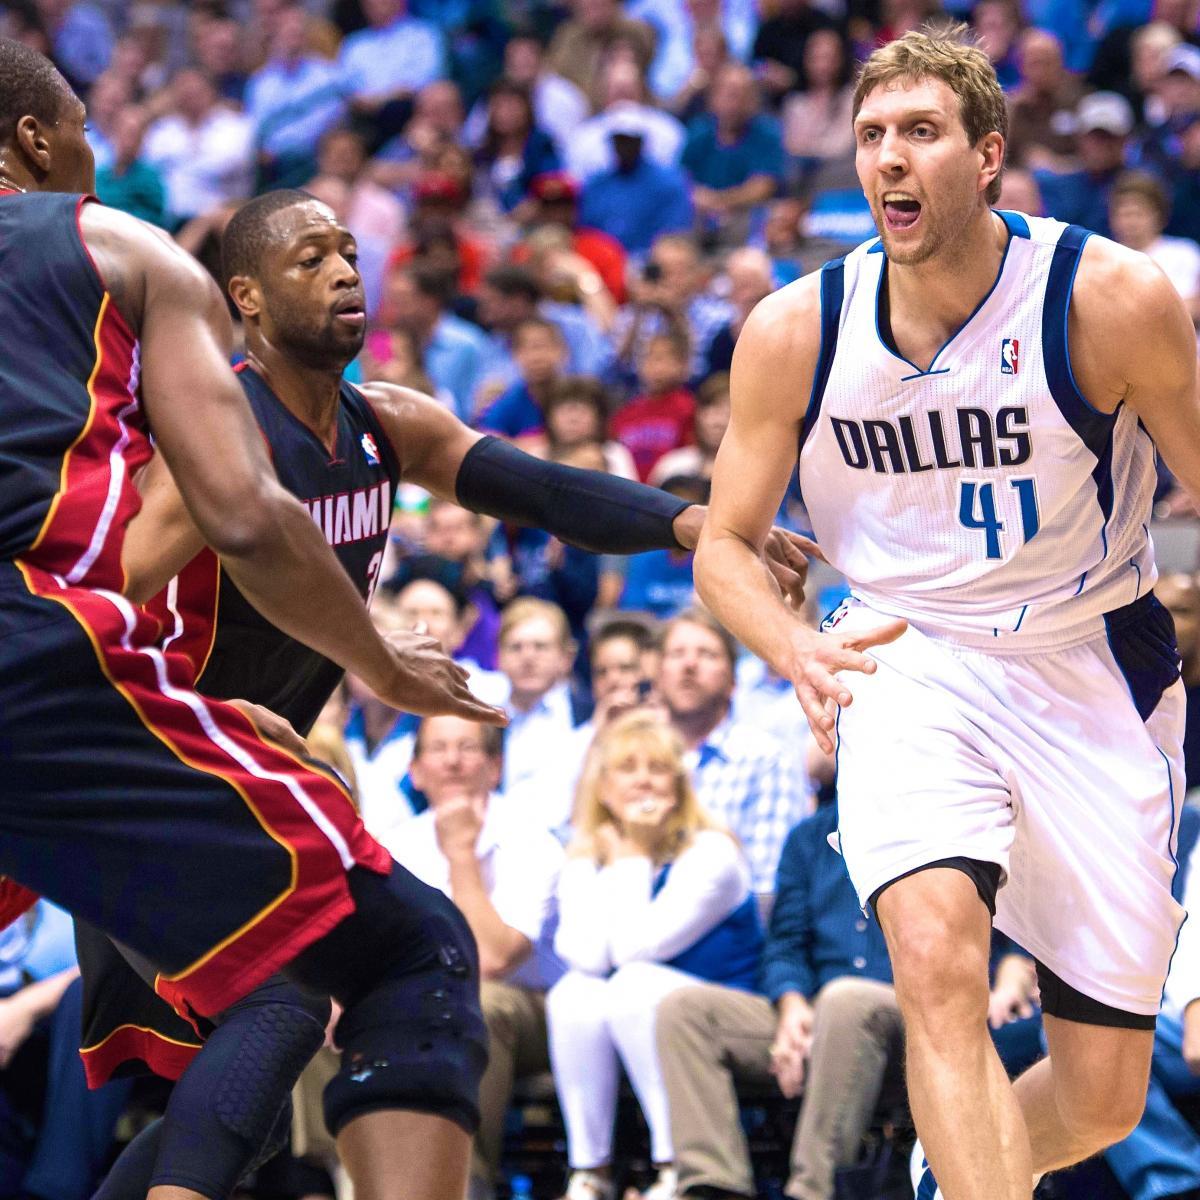 Miami Heat Vs. Dallas Mavericks: Live Score, Highlights